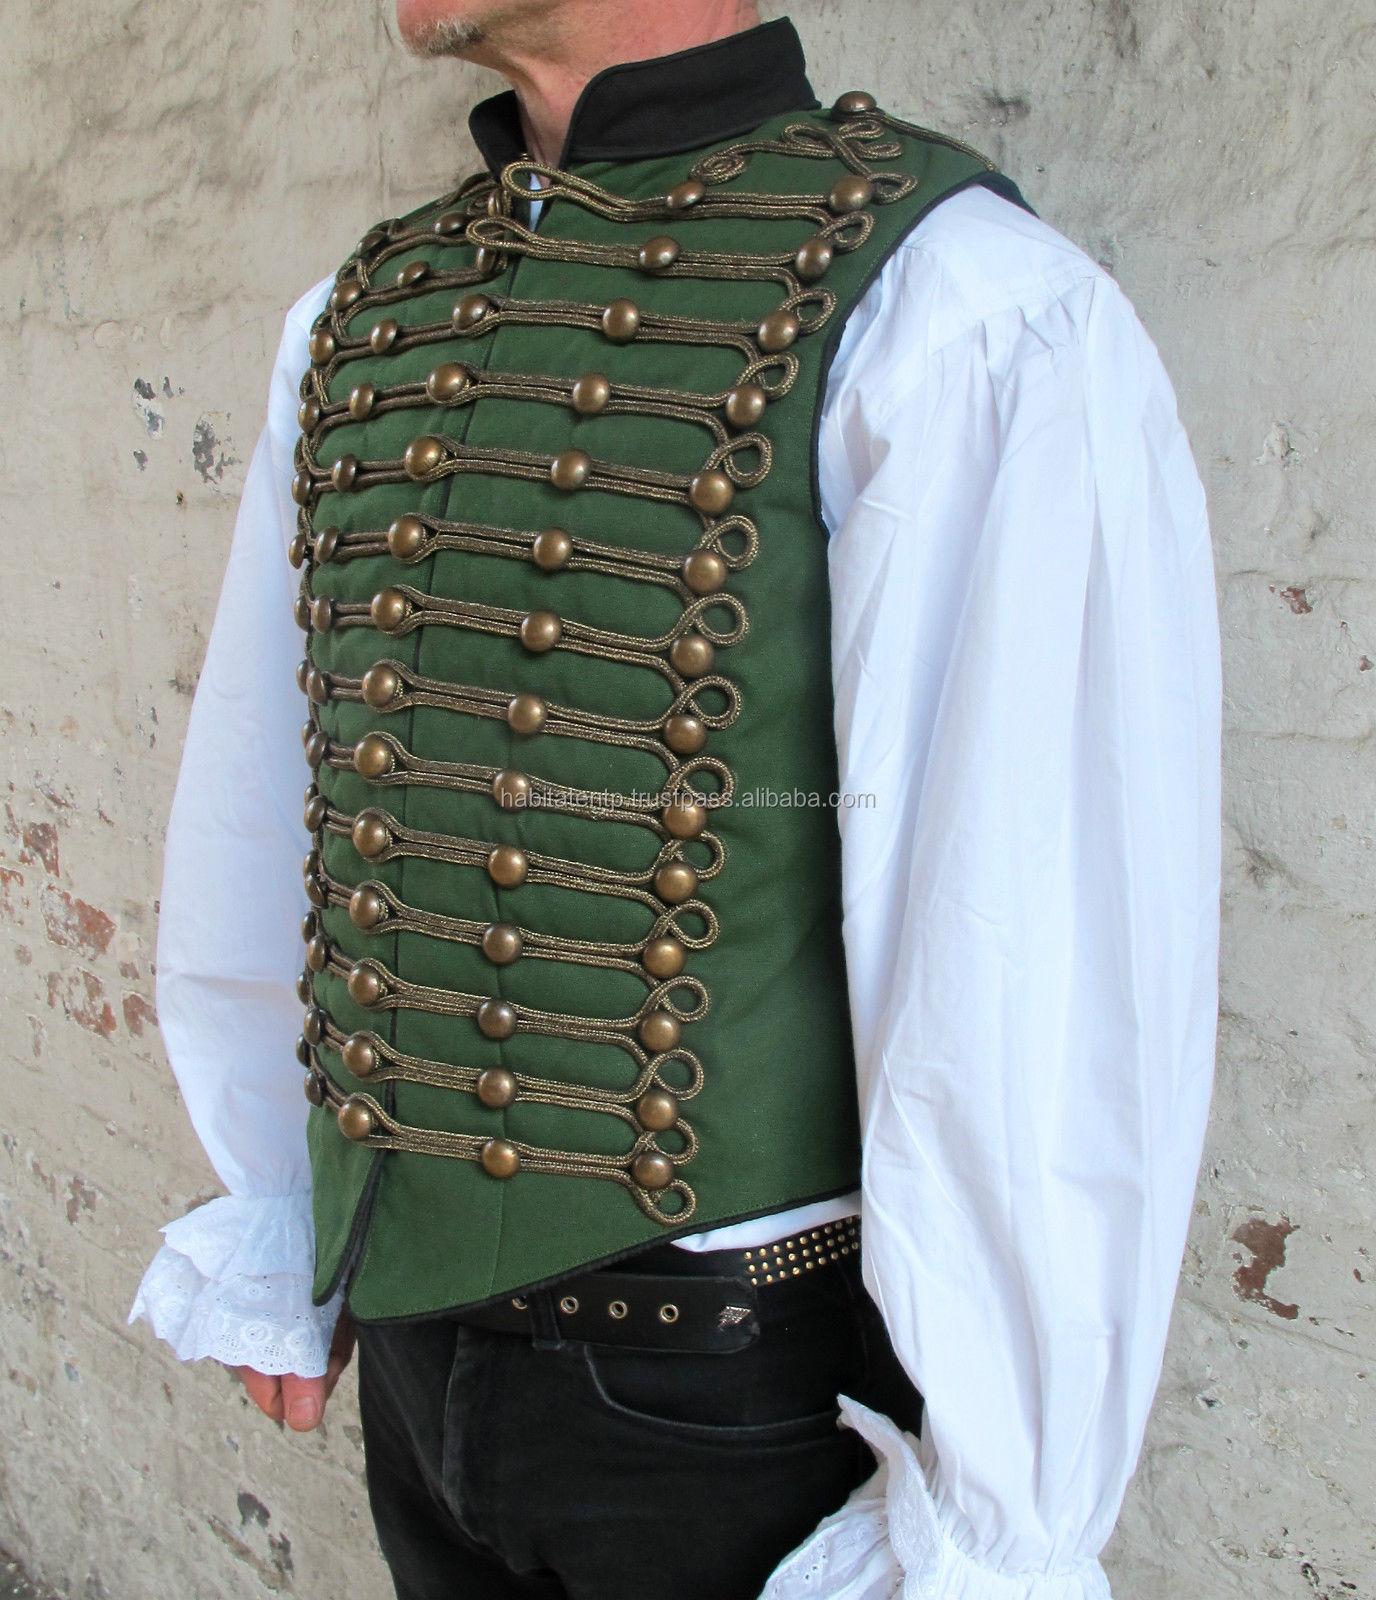 Green Black Military Waistcoat Braid Parade Tunic Guard Coat Costume Wedding